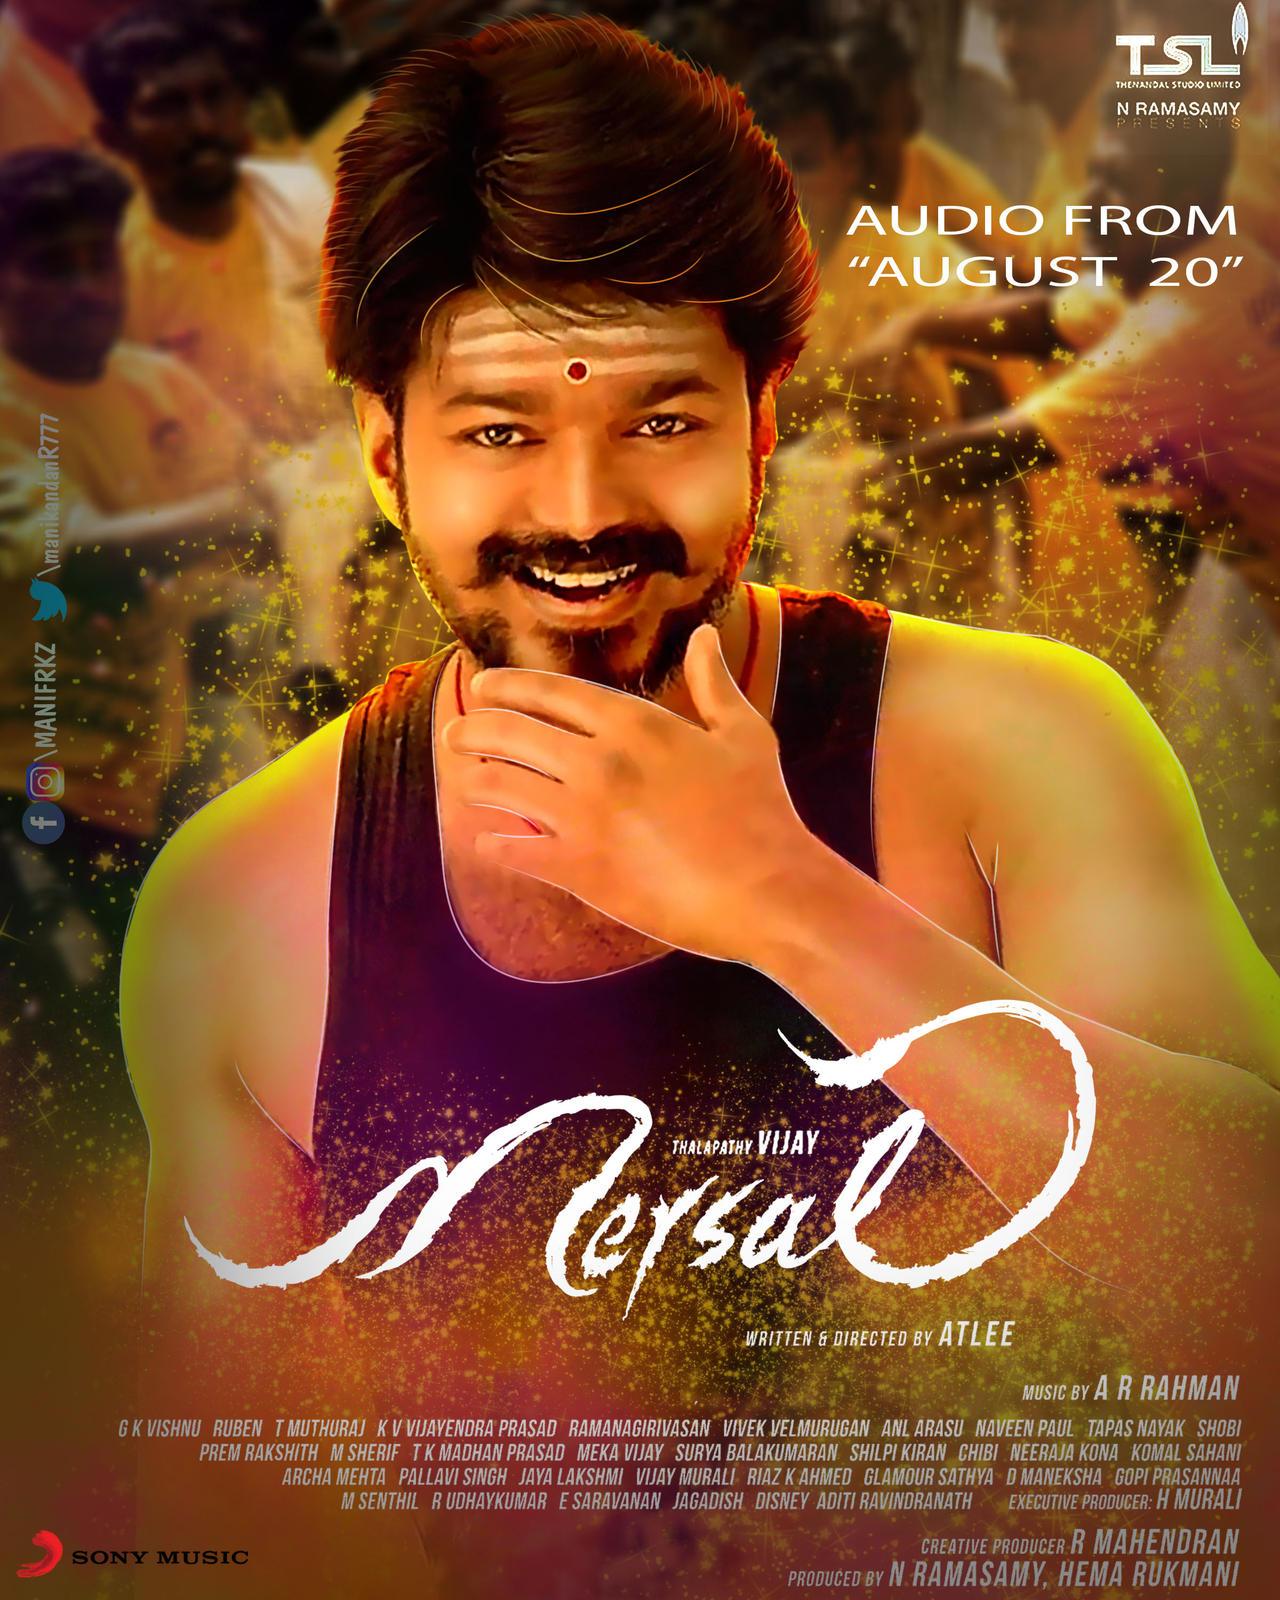 annadurai 2017 tamil full movie download online free (700mb) -